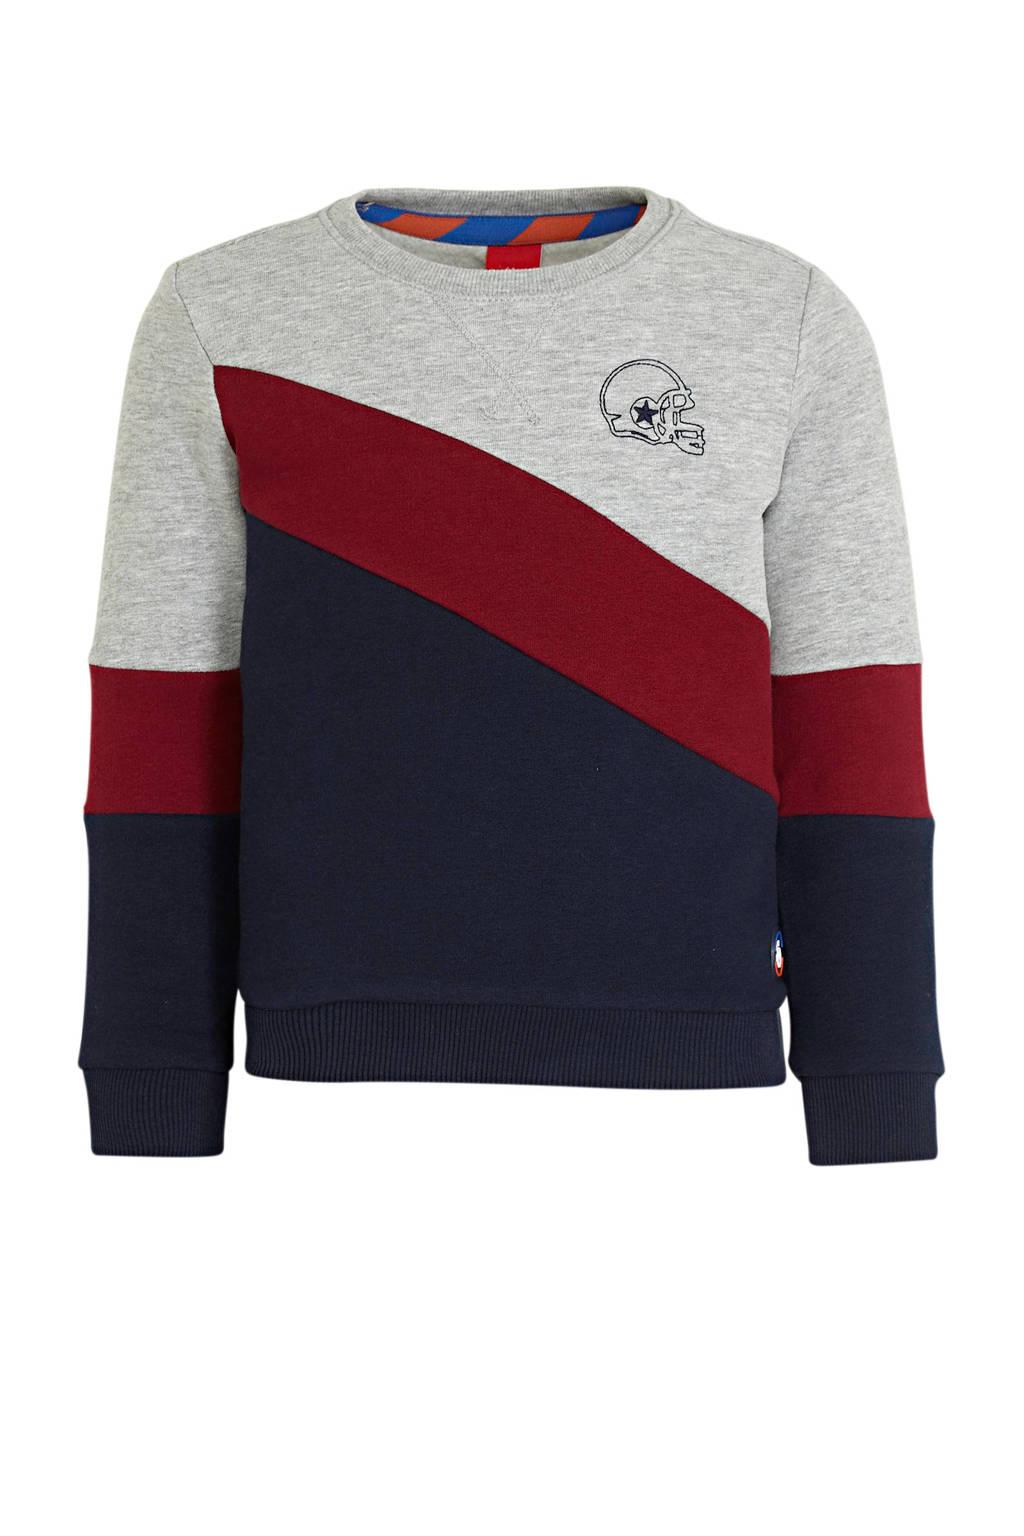 s.Oliver sweater donkerblauw/grijs melange/rood